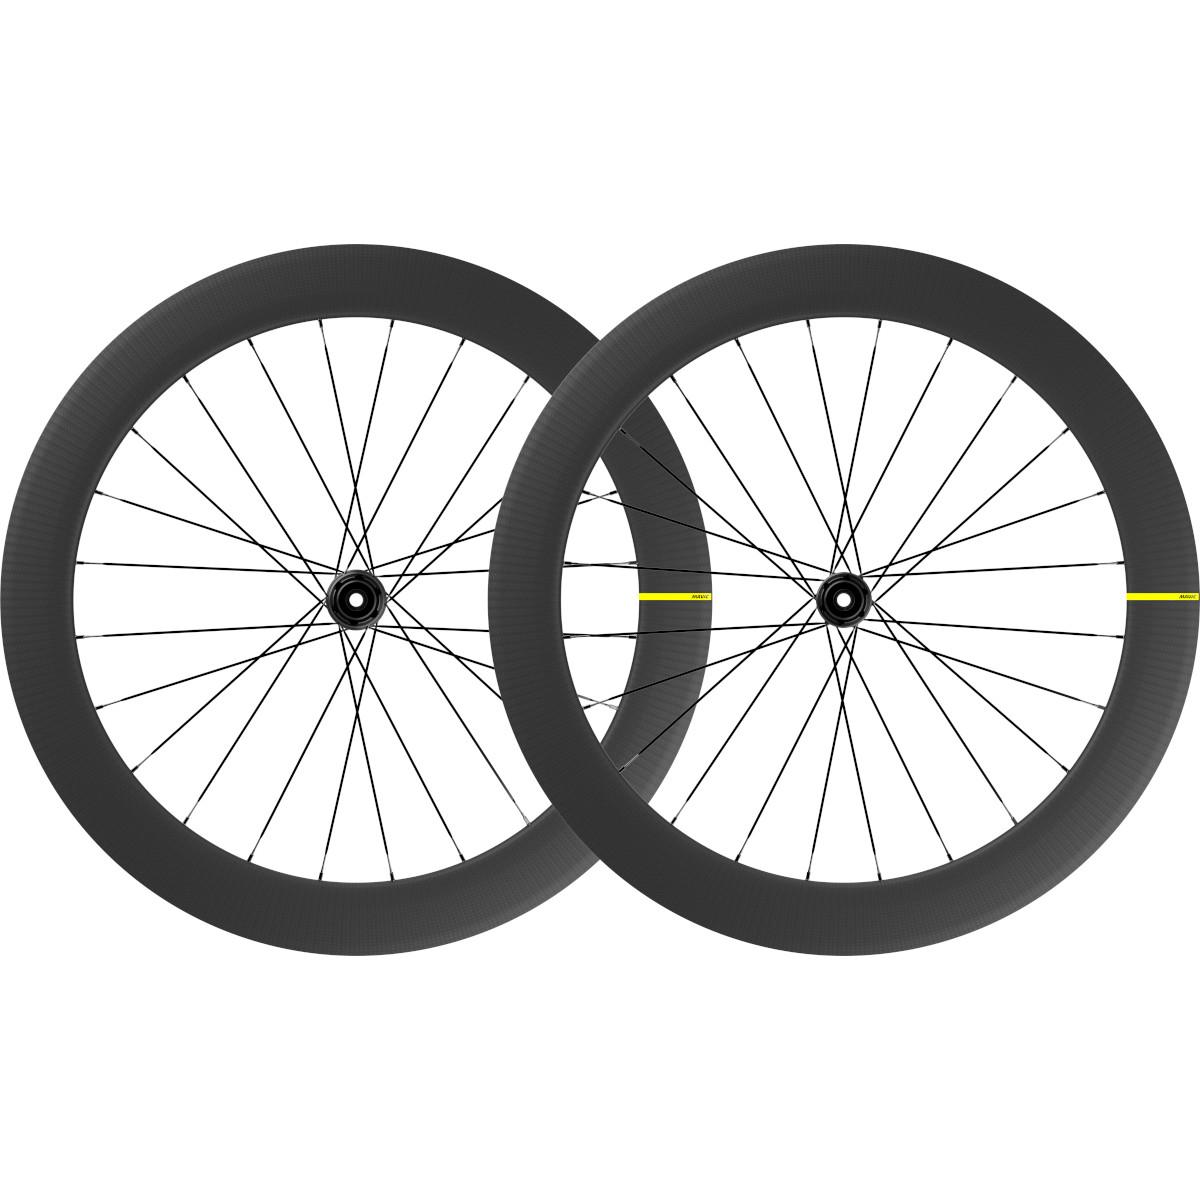 Mavic Cosmic SL 65 Disc Carbon UST Laufradsatz - Centerlock - VR: 12x100mm/QR | HR: 12x142mm/QR - SRAM XDR